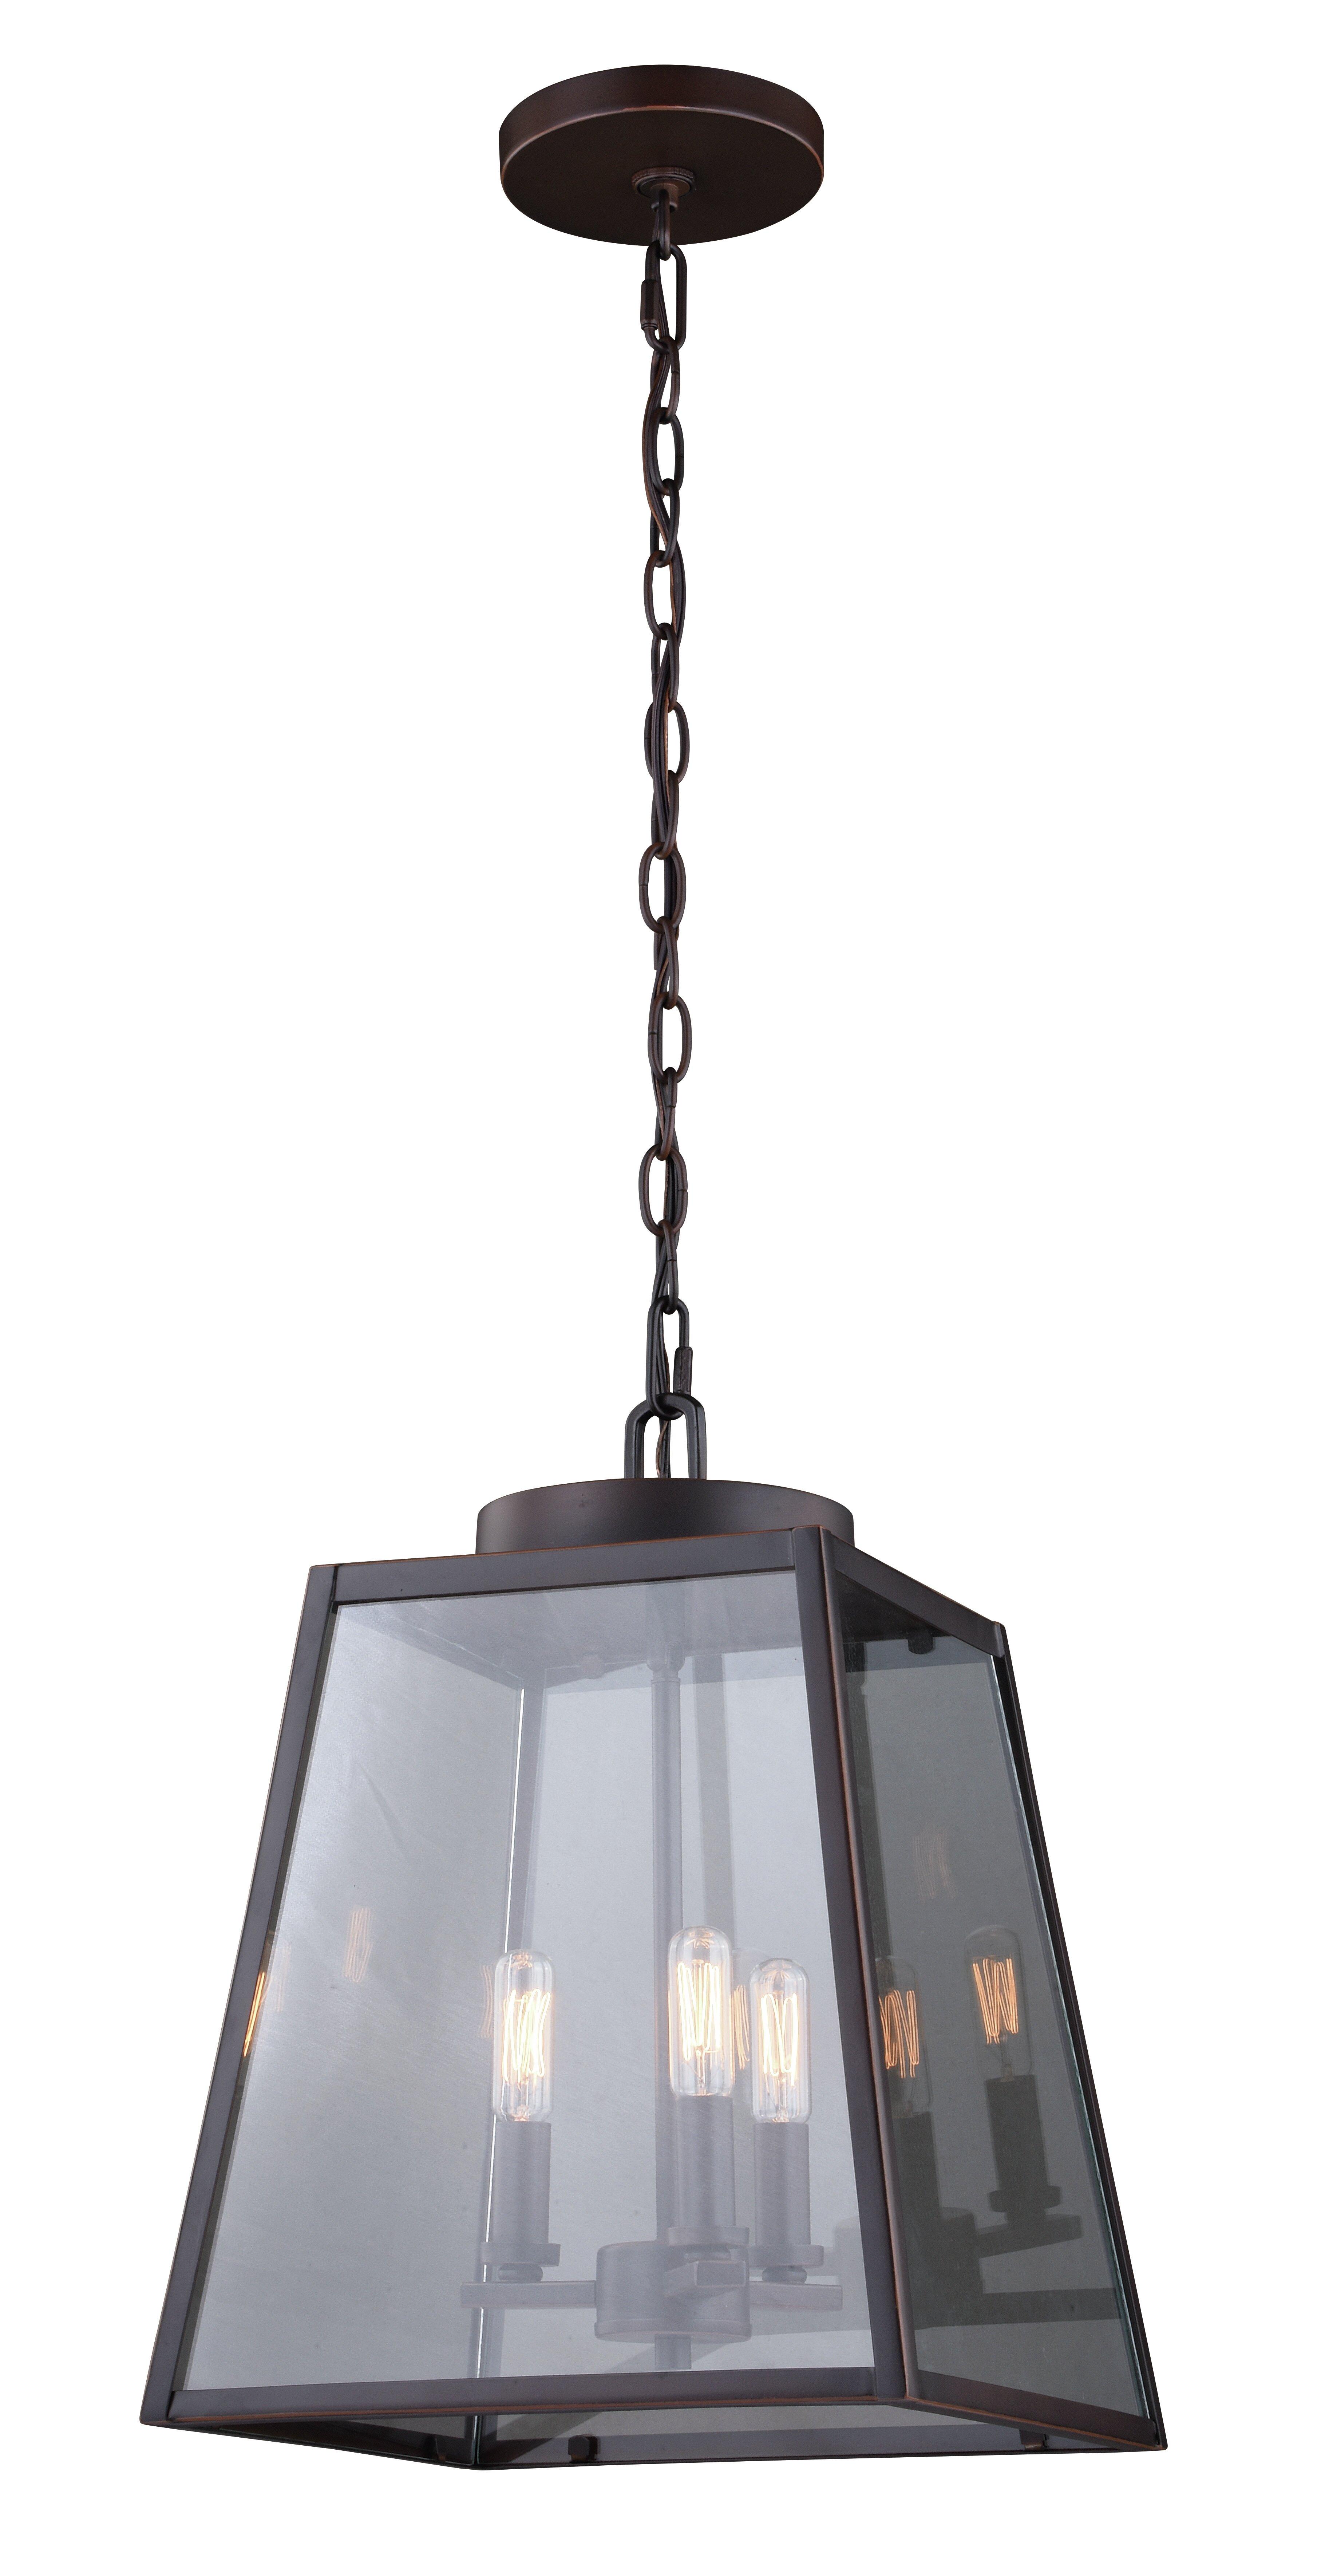 Louanne 3 Light Lantern Geometric Pendant & Reviews | Joss Pertaining To 3 Light Lantern Cylinder Pendants (View 21 of 30)